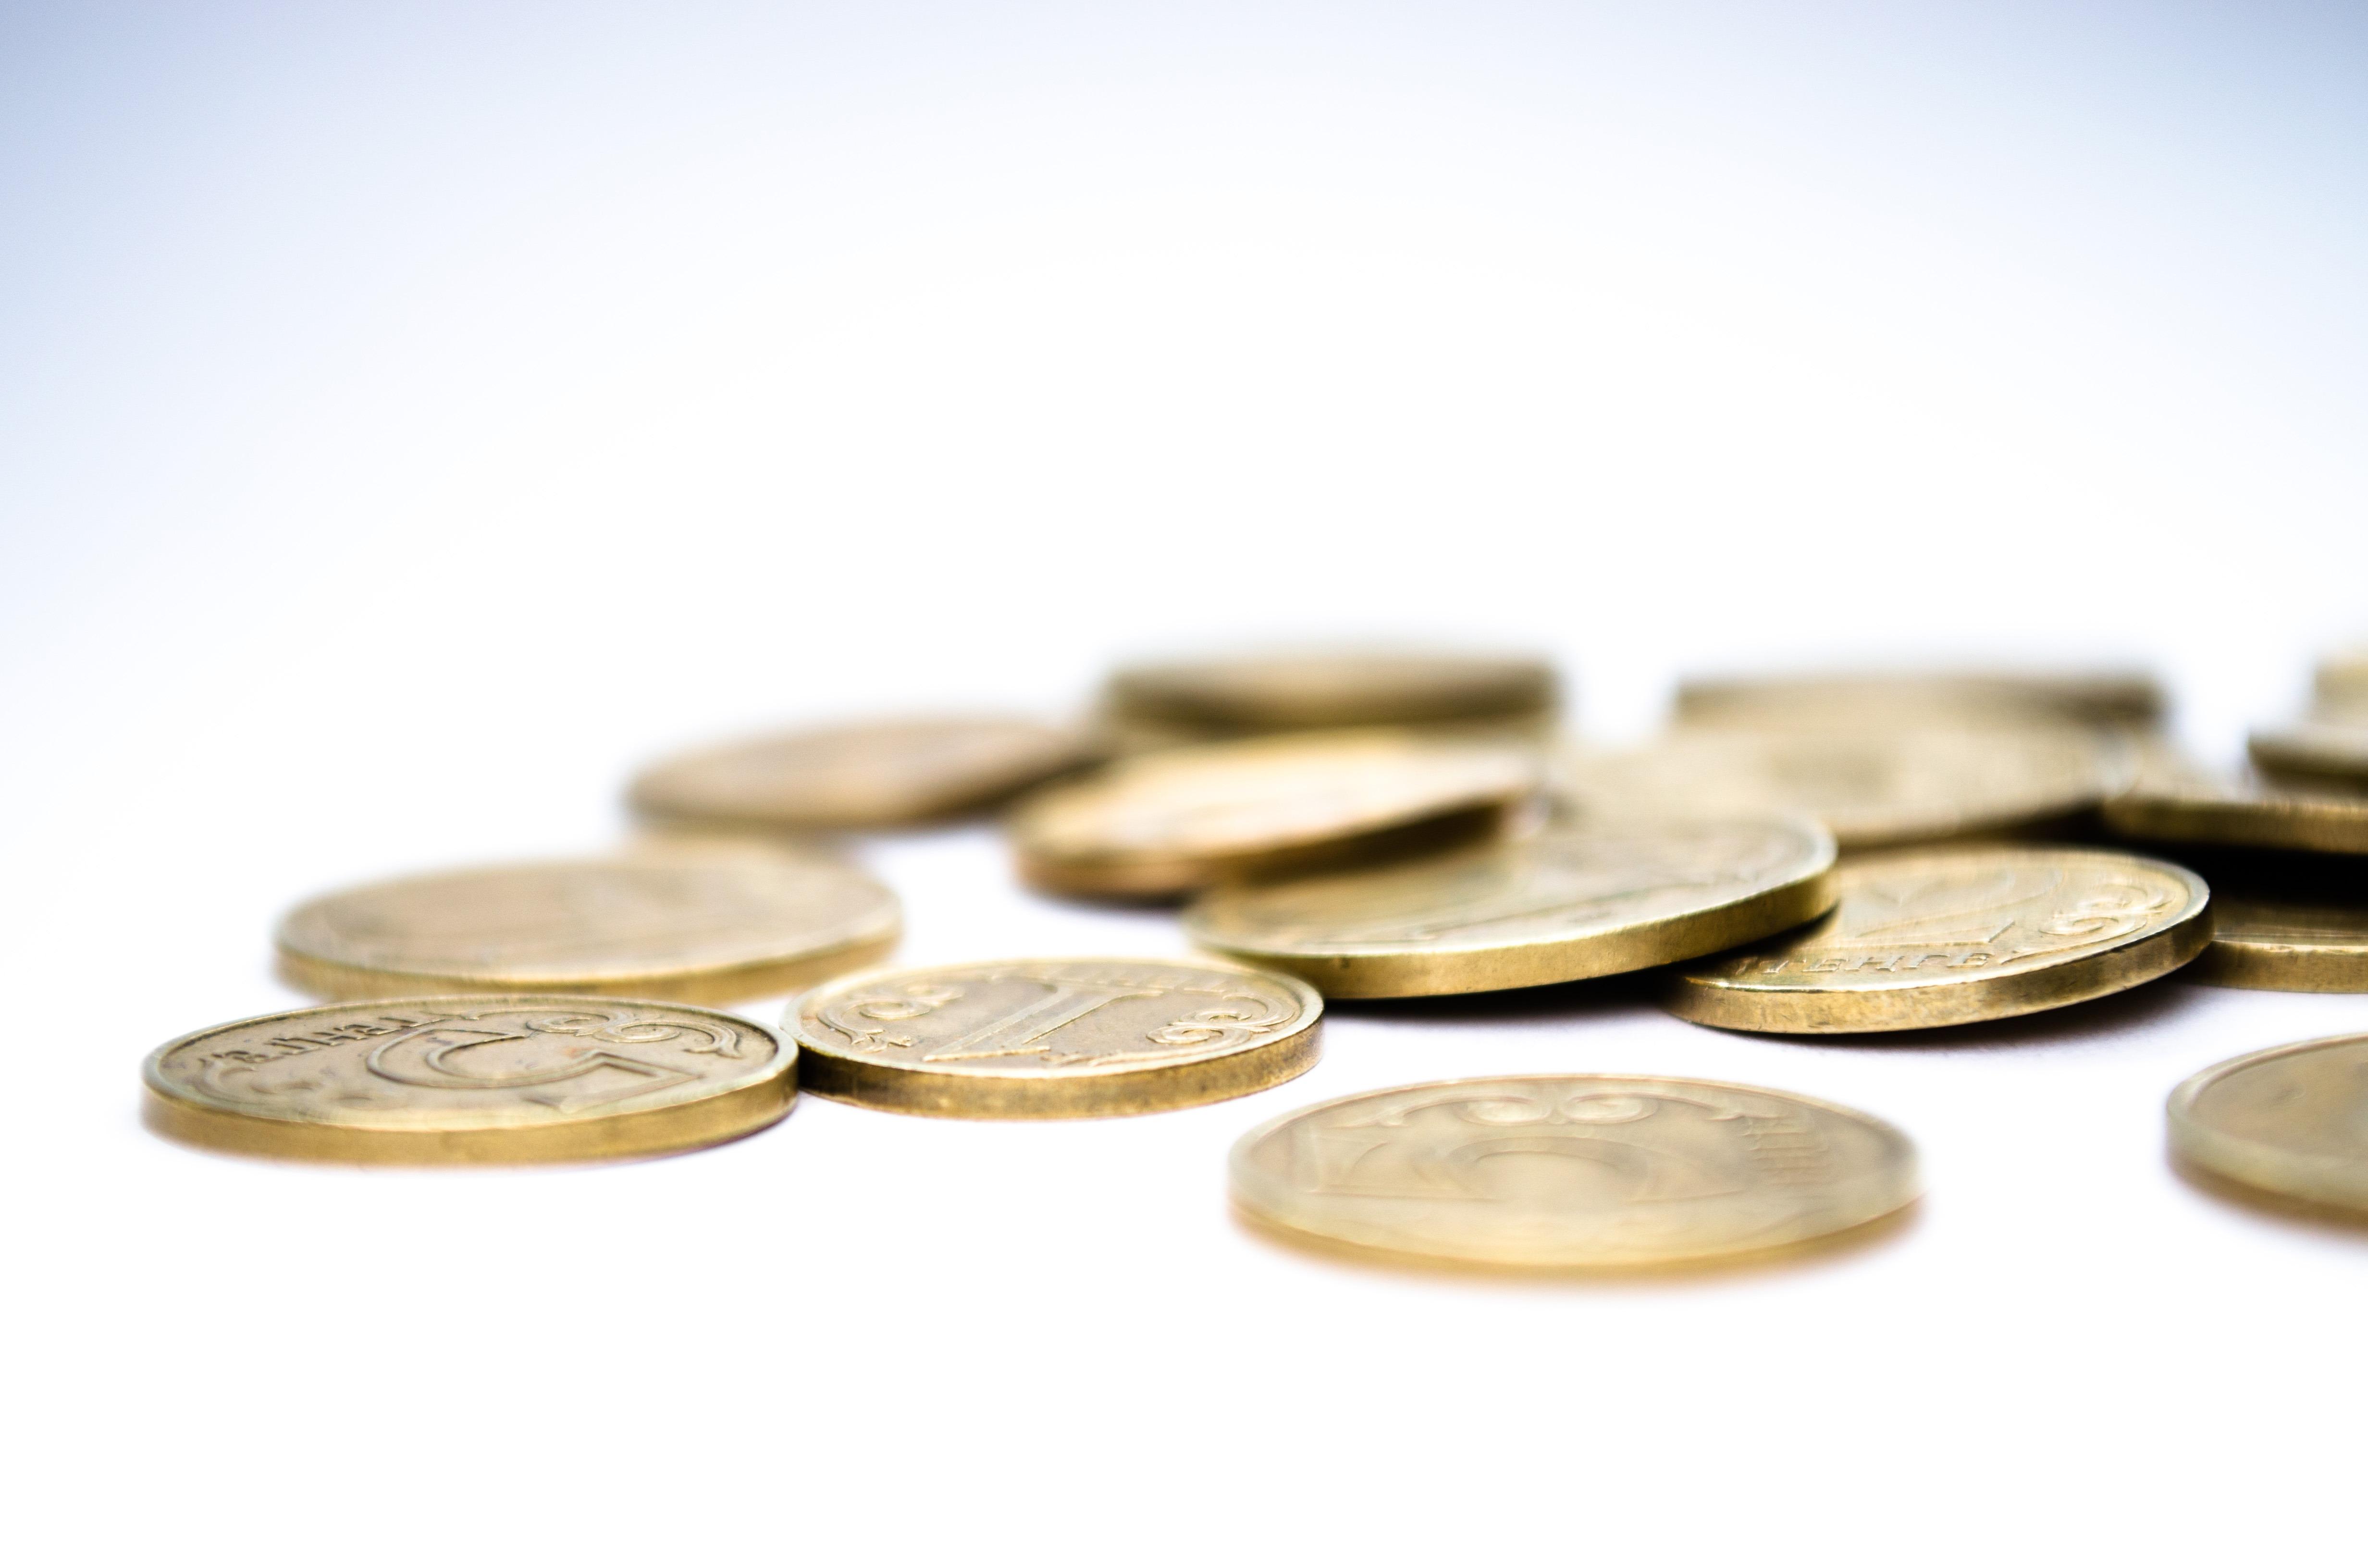 Pragmatic NoxWin com rentabilidad deposito a plazo fijo 797030